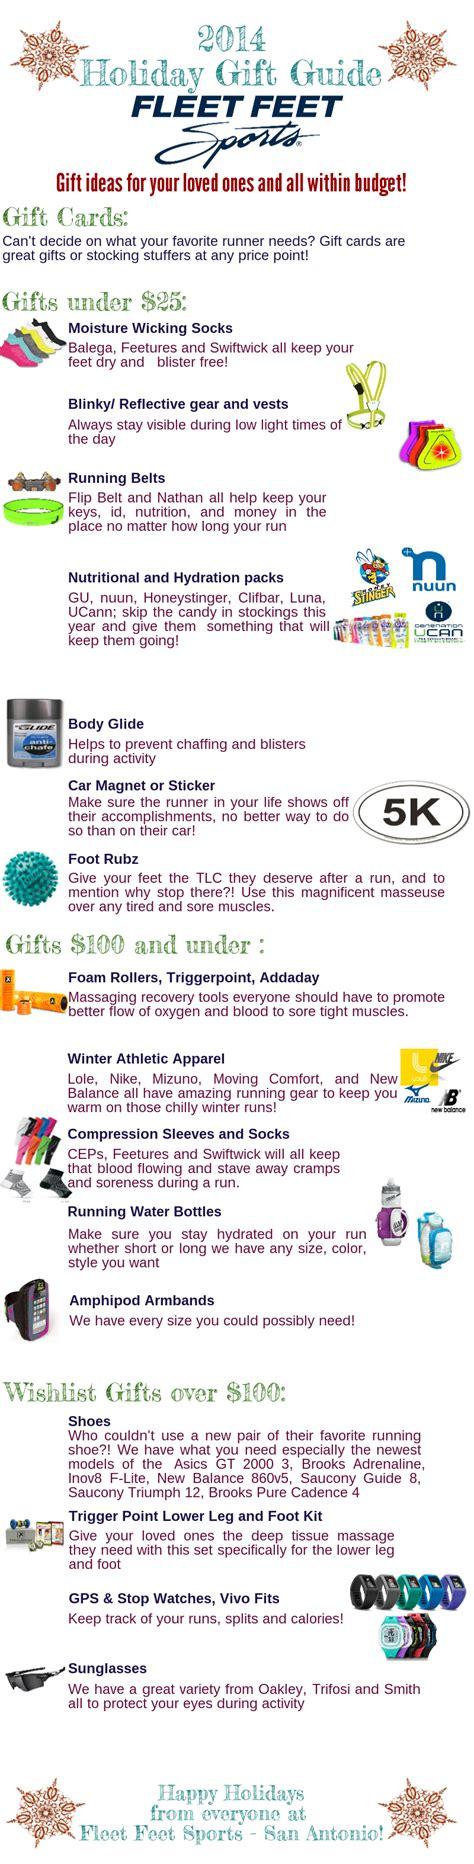 Big 5 Gift Card Balance Inquiry - fleet feet holiday gift guide fleet feet sports san antonio